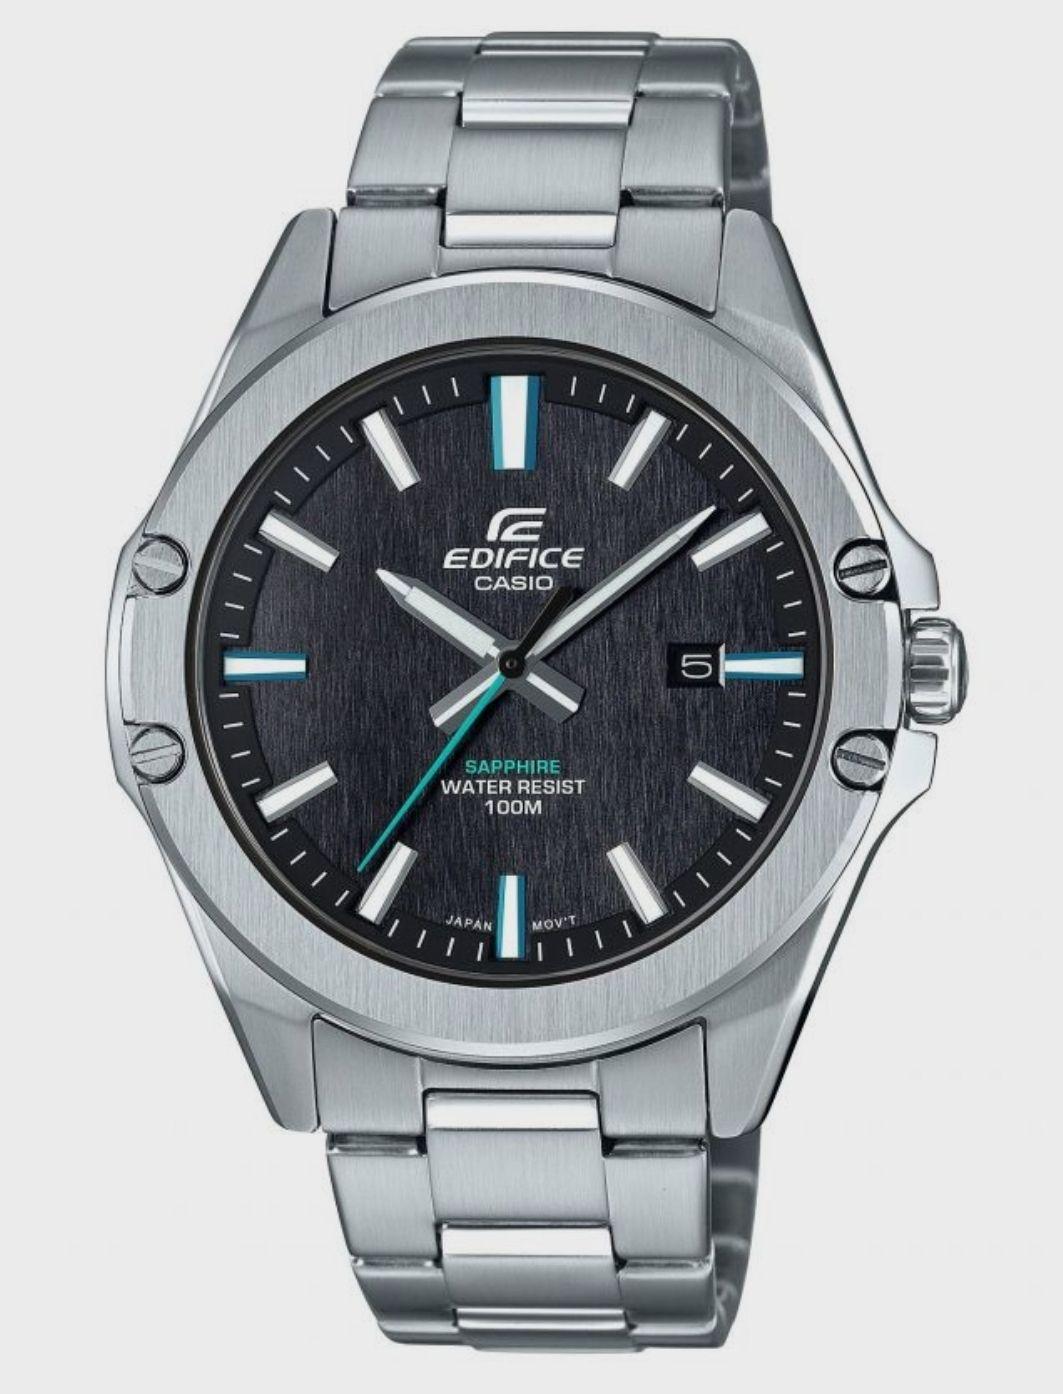 Casio Edifice Watch EFR-S107D-1AVUEF £81 at Watch Shop